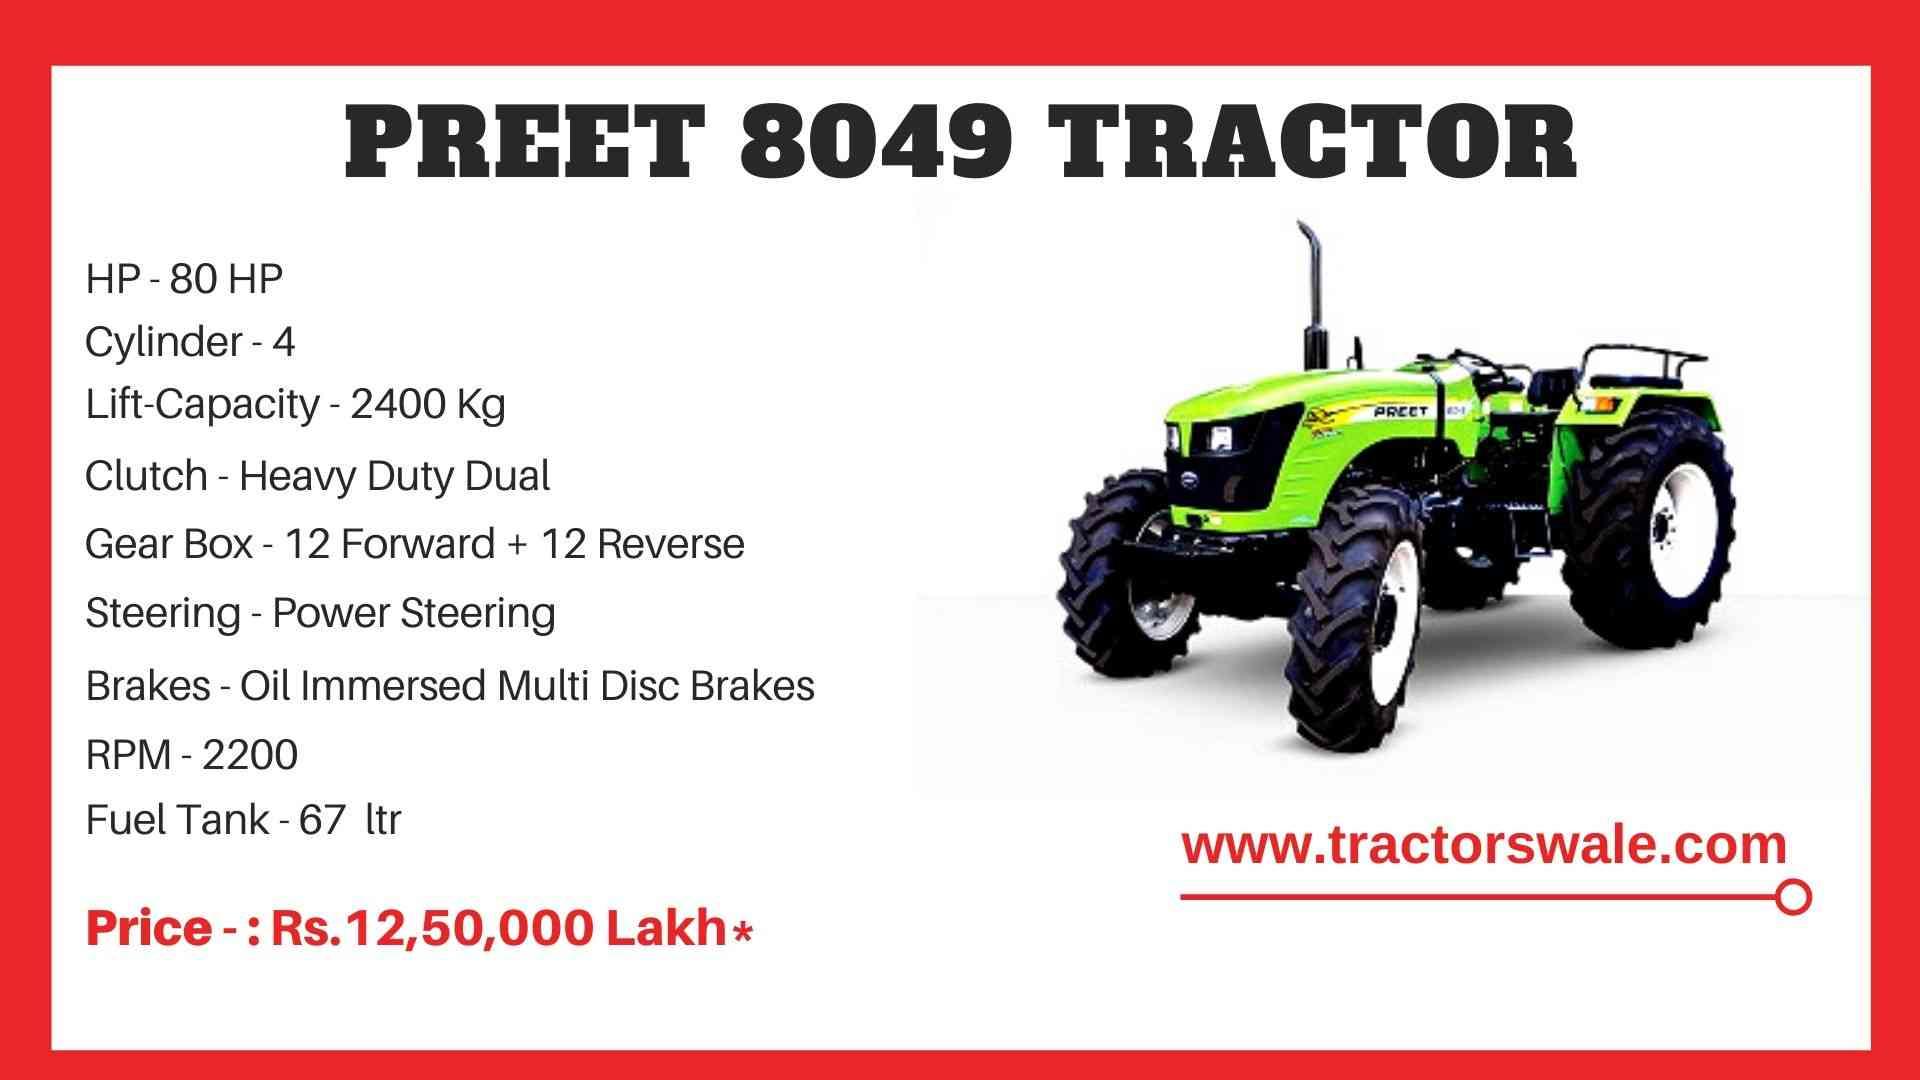 Preet 8049 tractor price